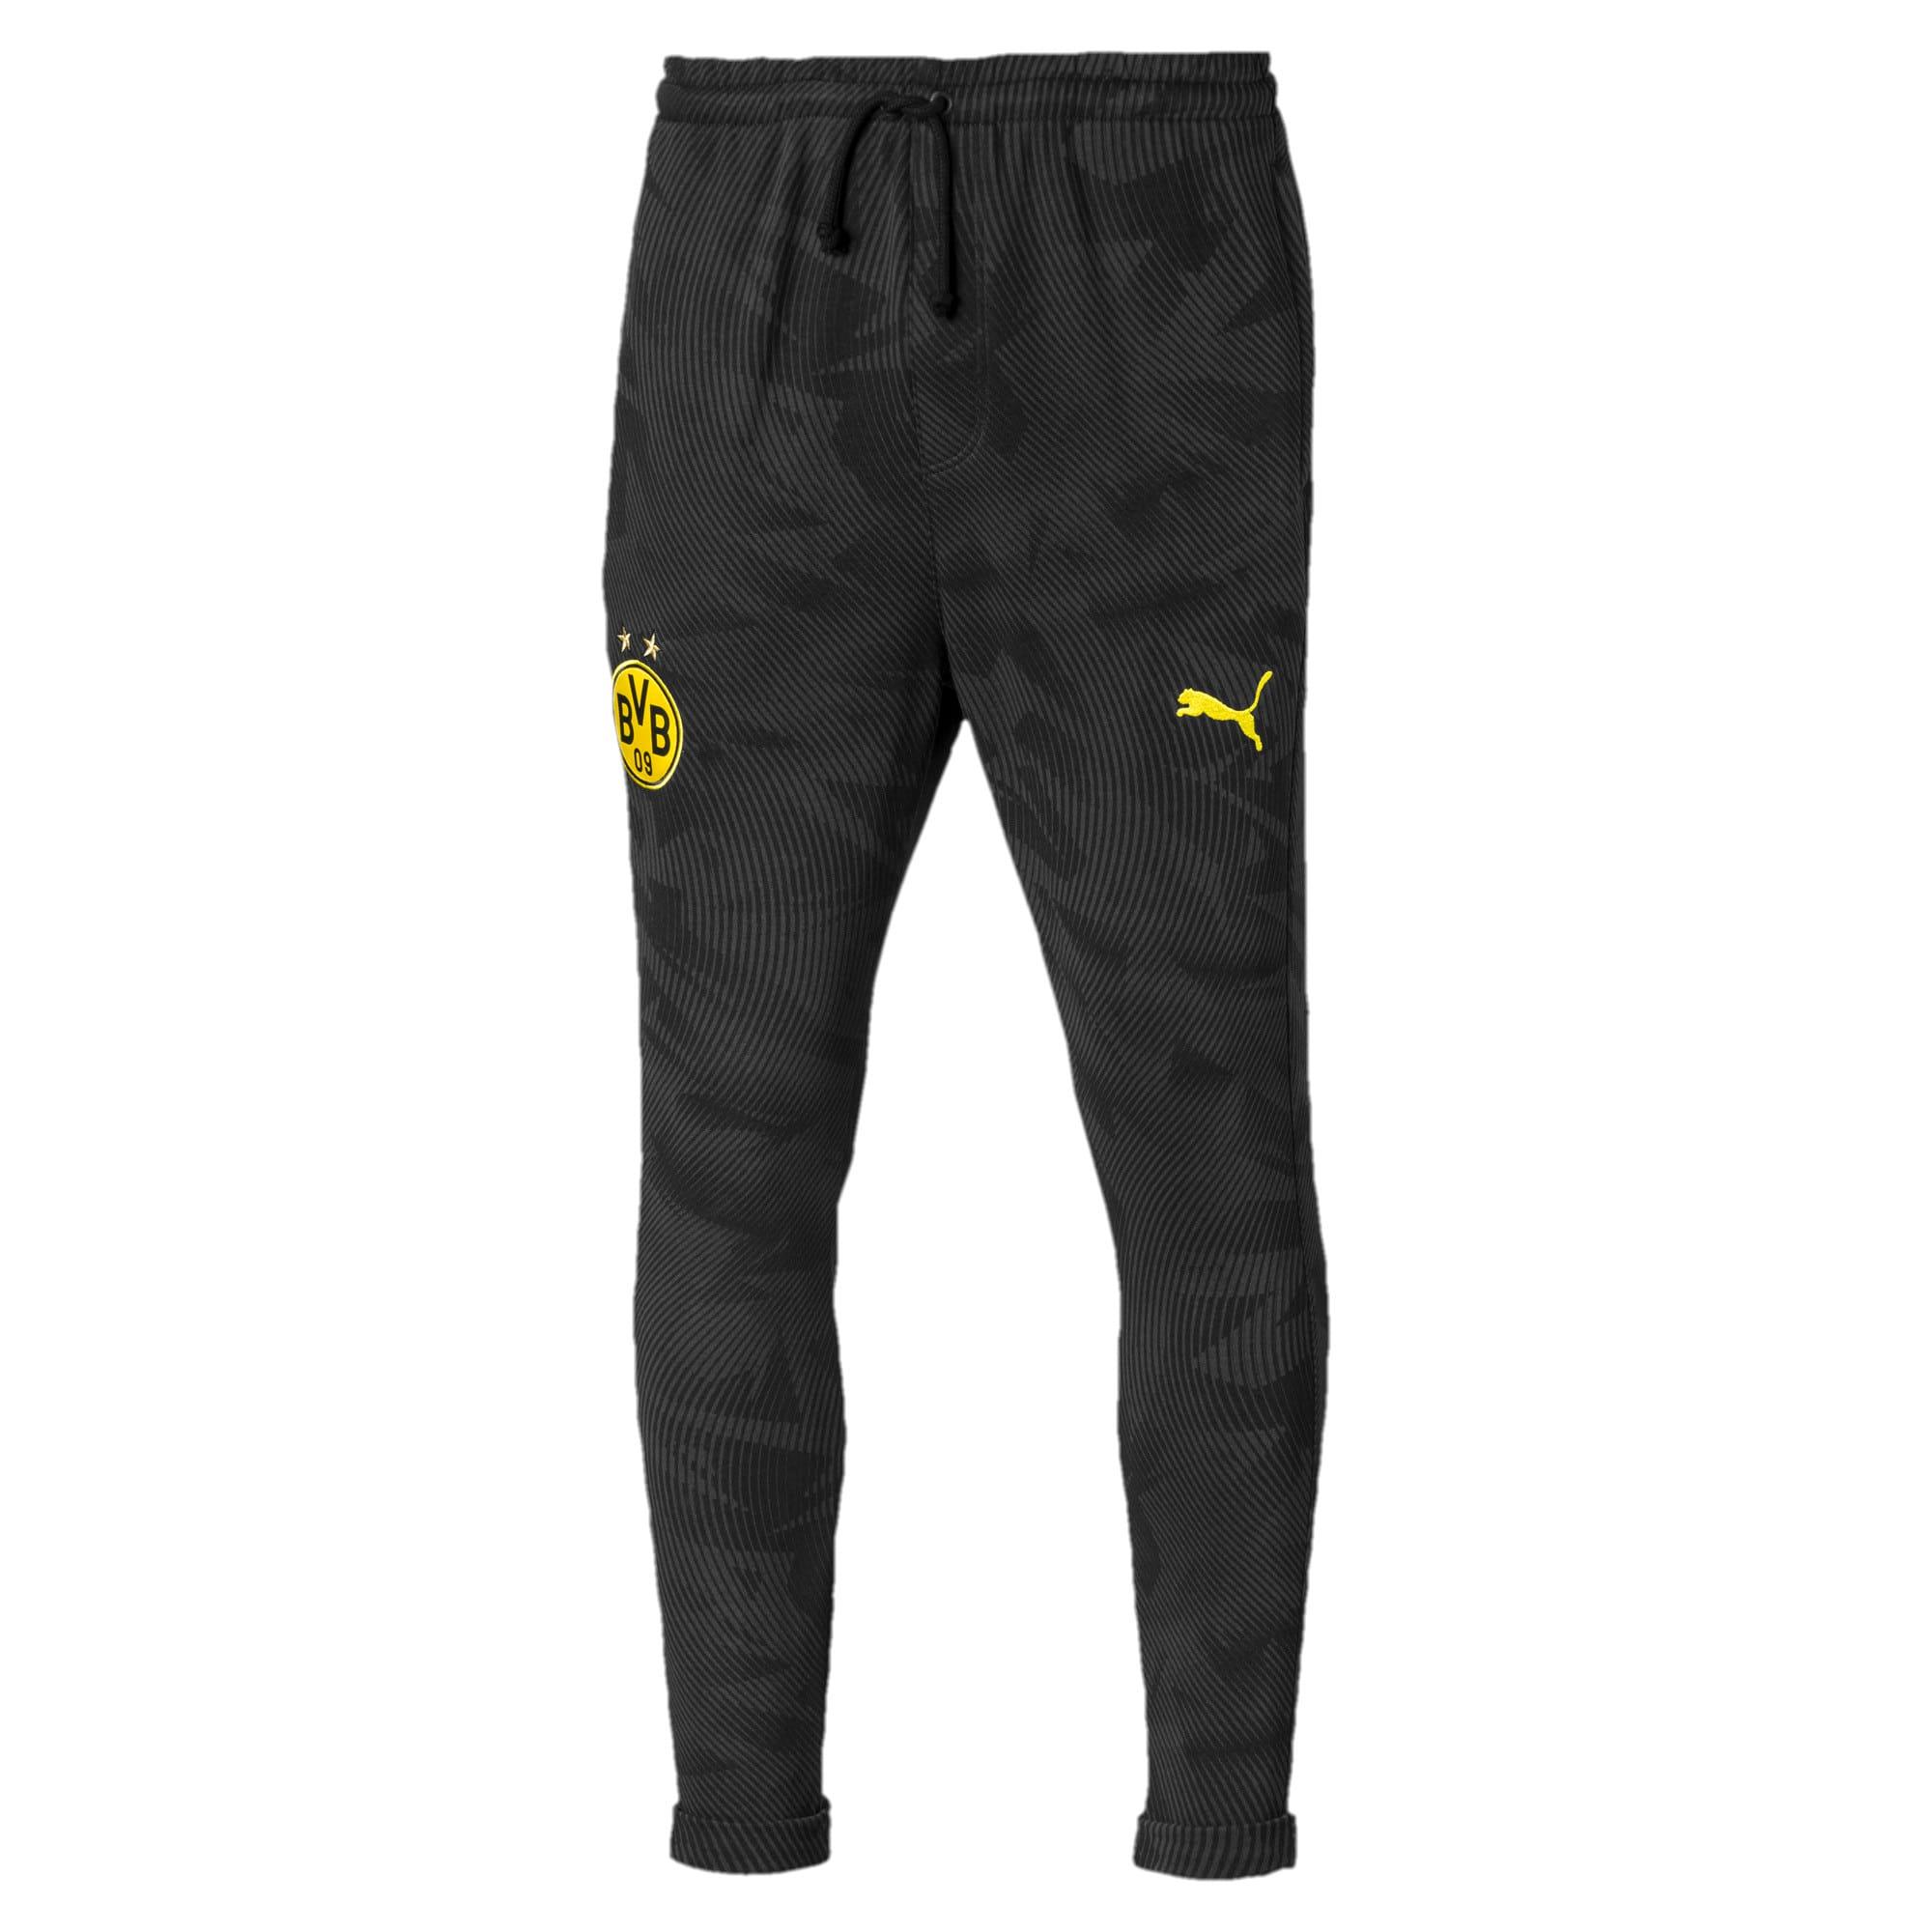 Thumbnail 4 of BVB Men's Casual Pants, Puma Black-Phantom Black, medium